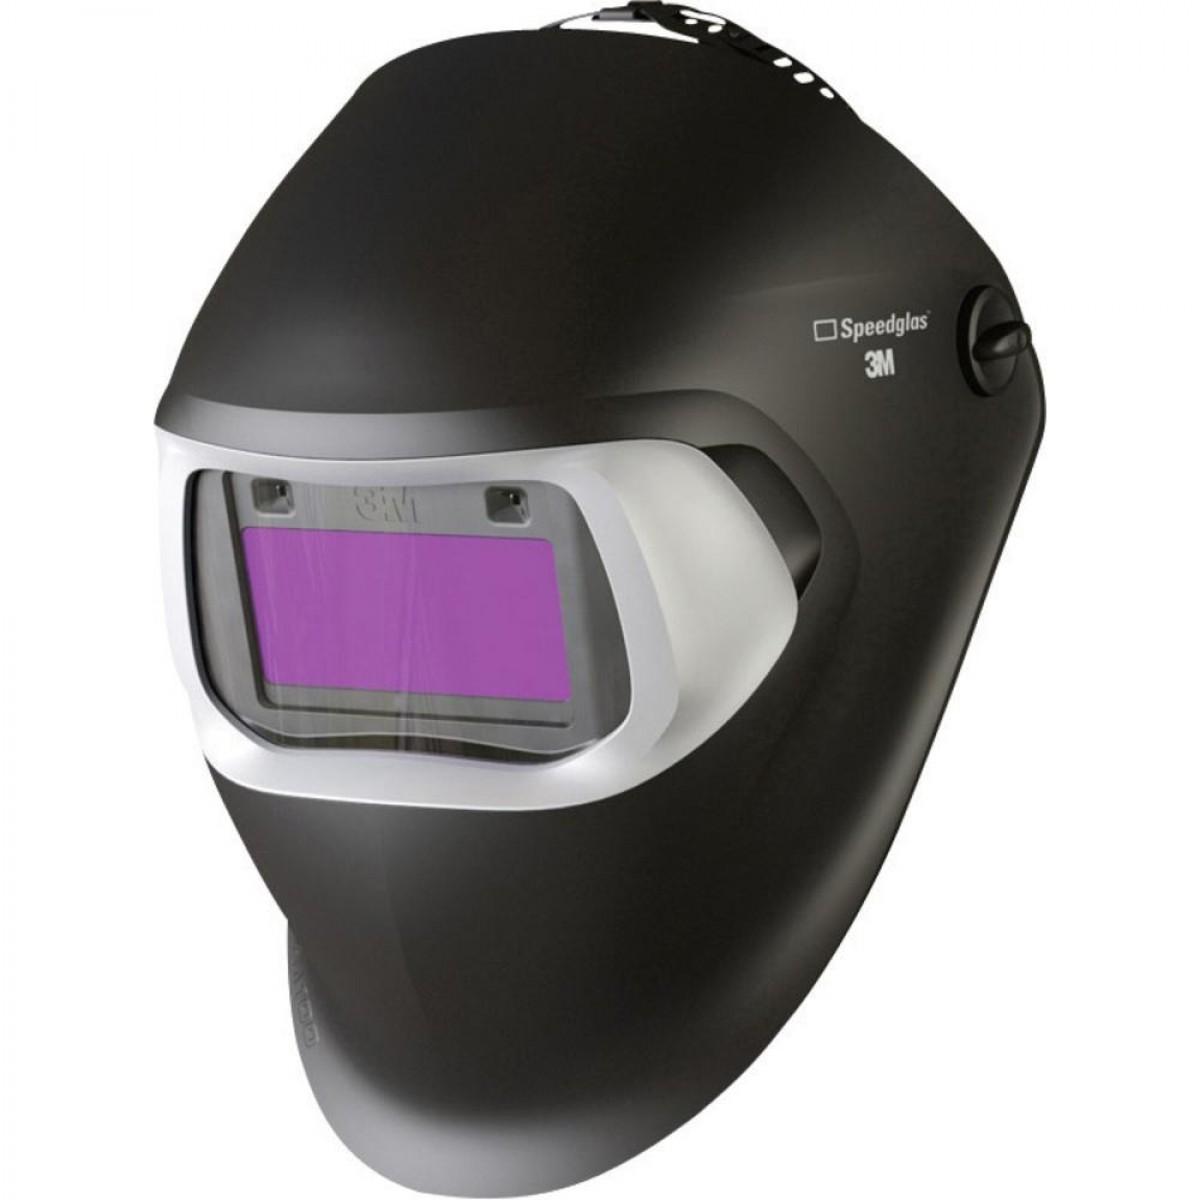 3M Speedglas svejsehjelm 100V-31